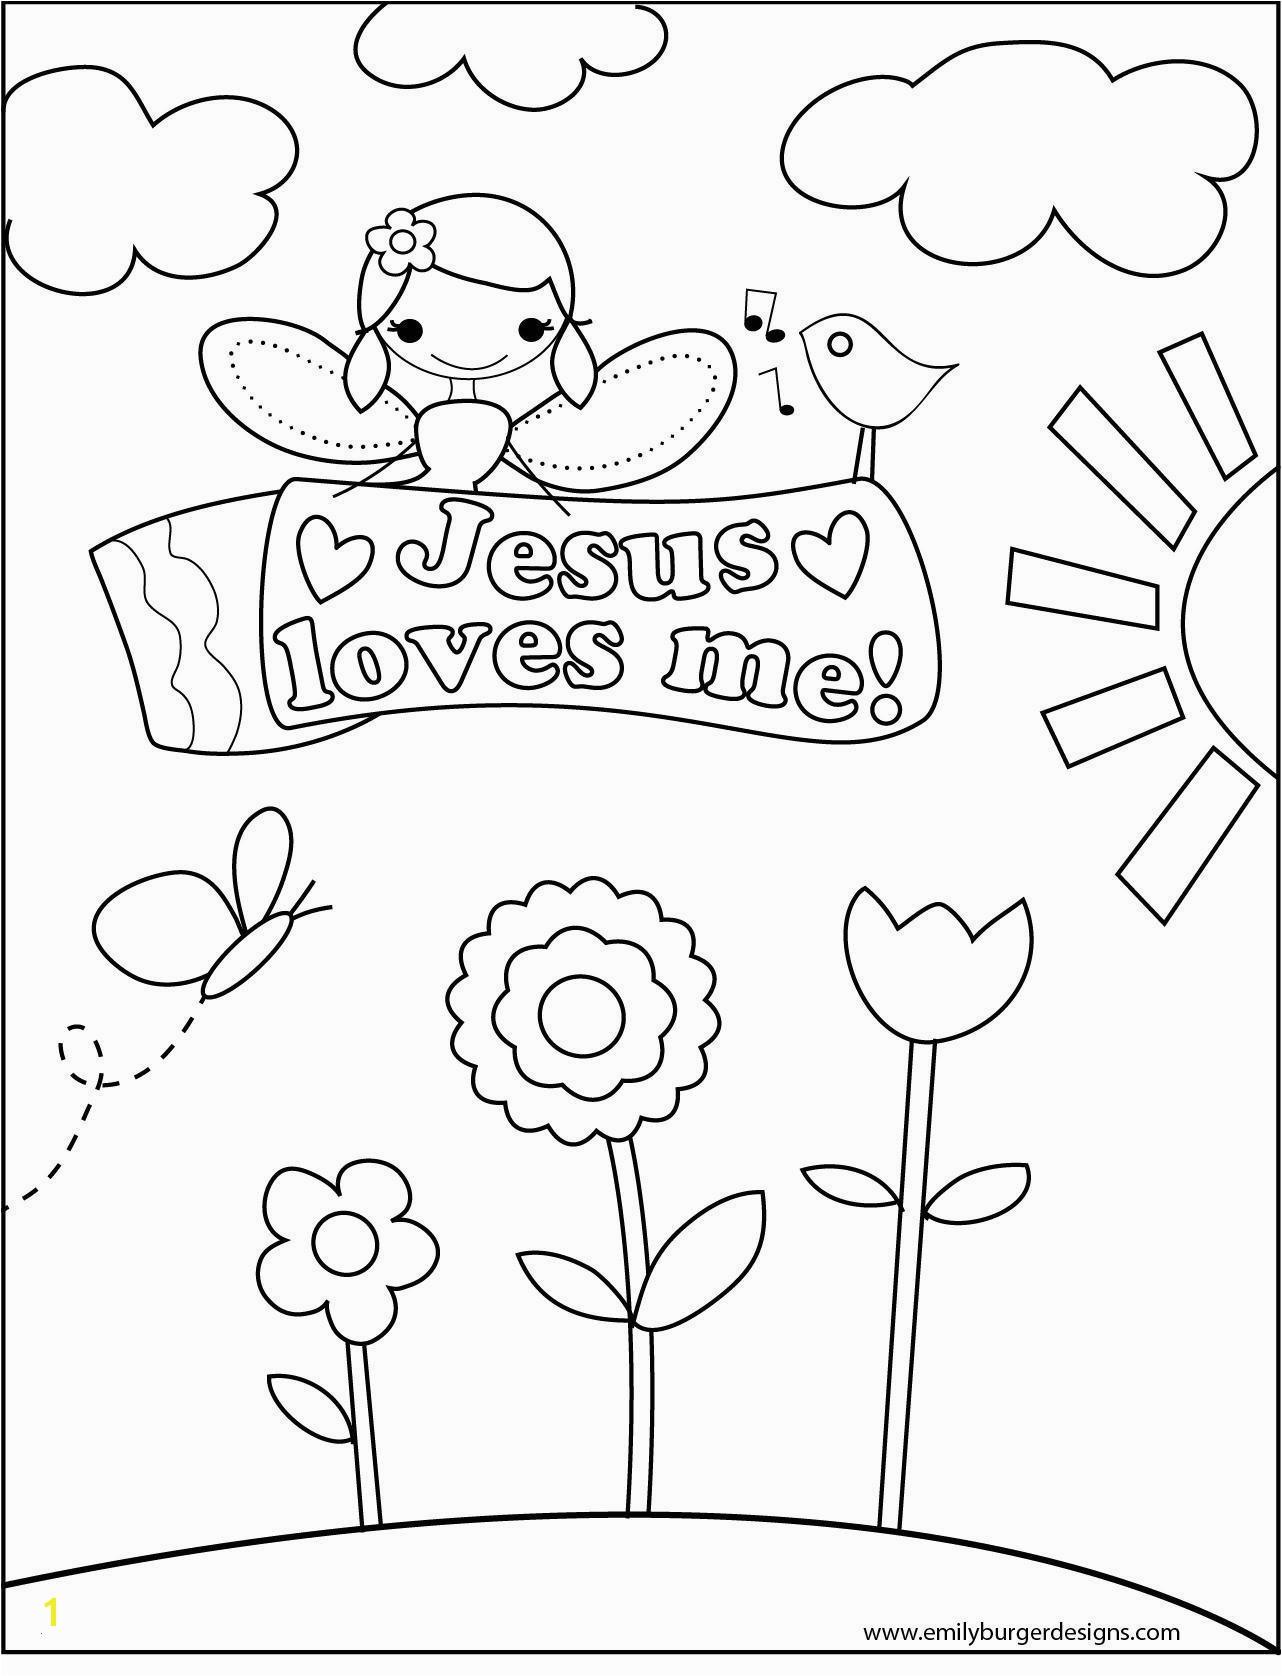 Jesus Loves Me Coloring Page Elegant Color Page Jesus Best Coloringjesus Loves Me Color Page